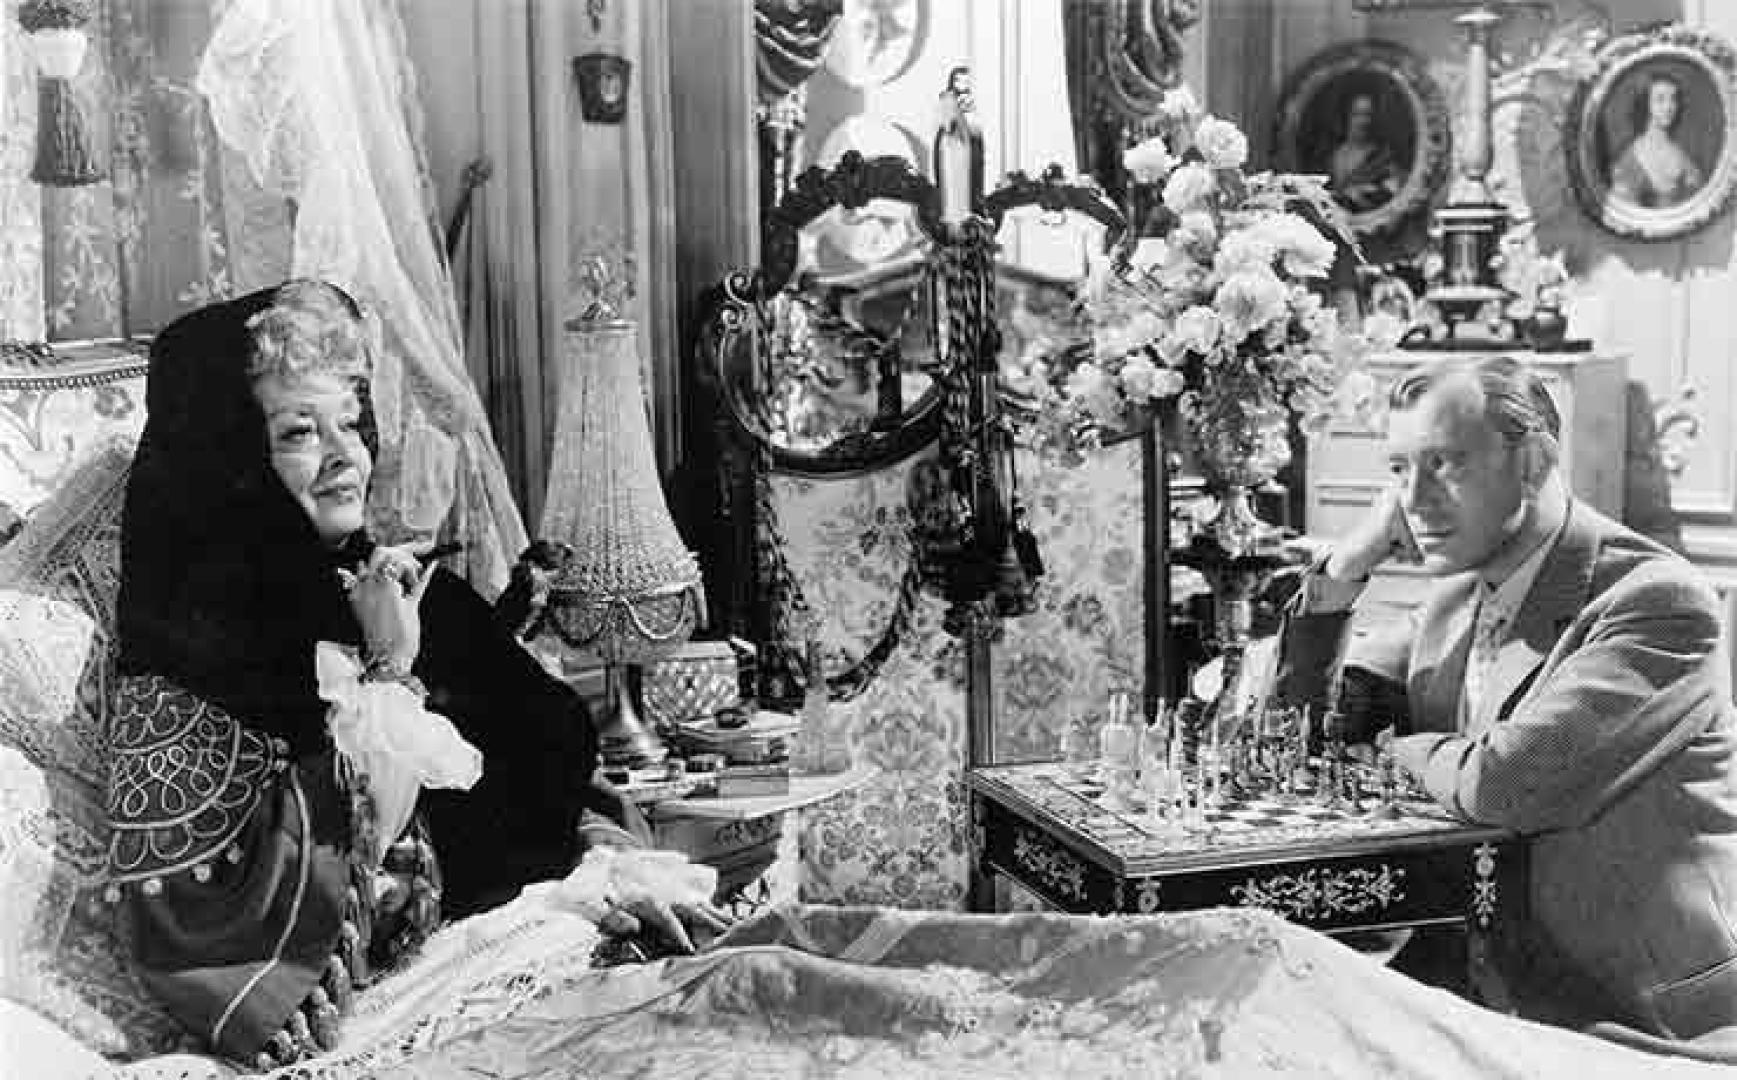 The Scapegoat - A bűnbak (1959) 1. kép